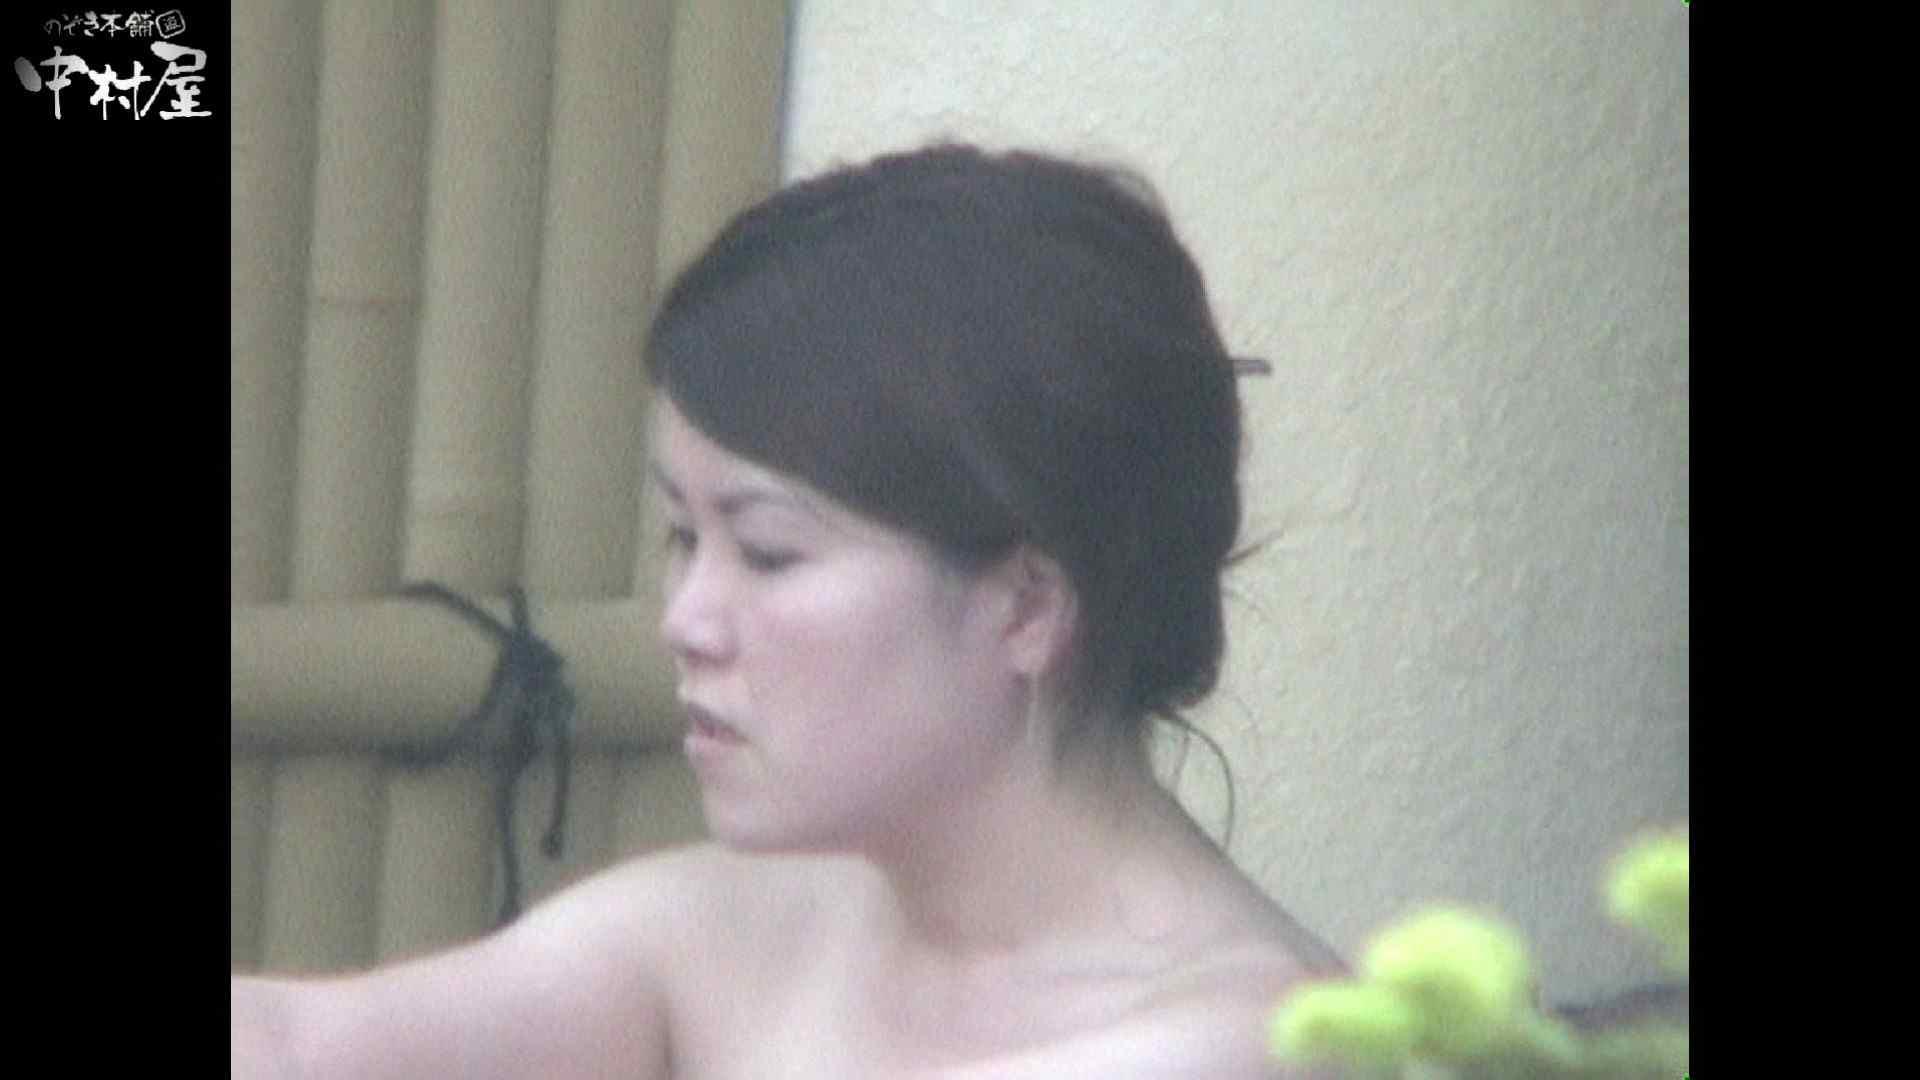 Aquaな露天風呂Vol.935 盗撮 ヌード画像 106画像 104